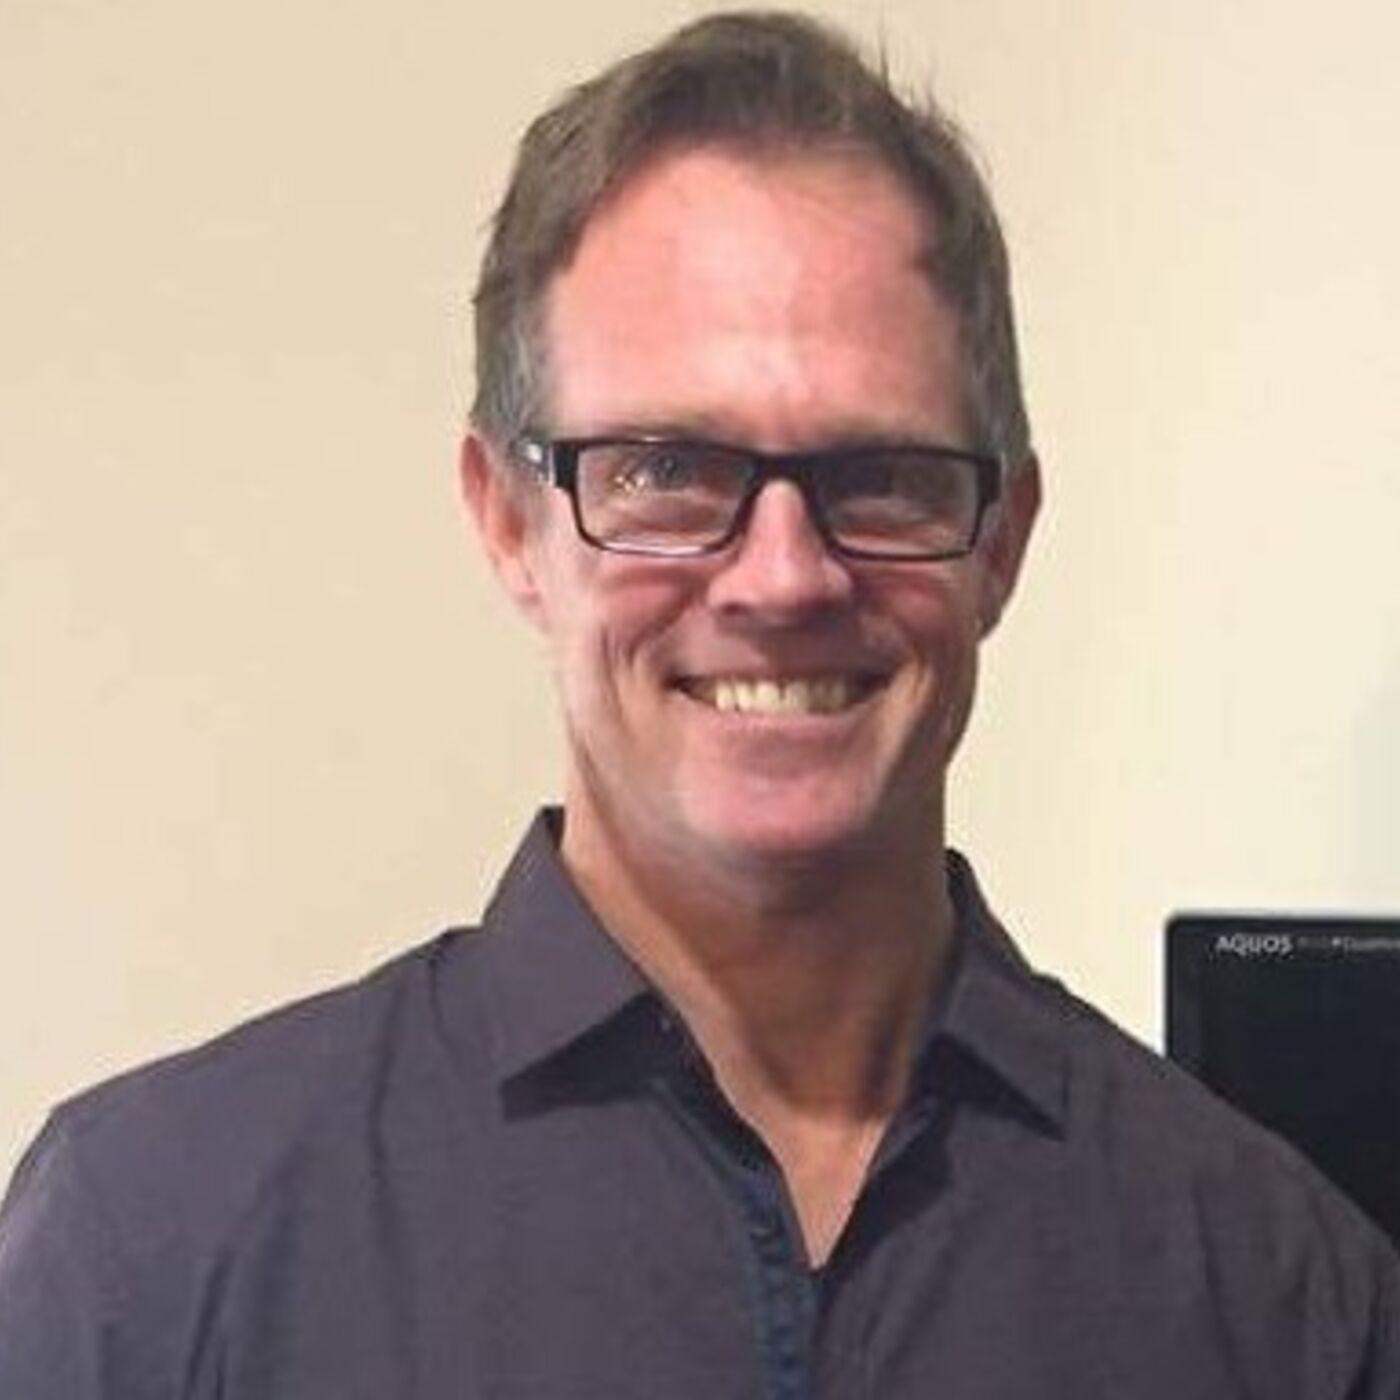 Dan Reyman - Health and Fitness